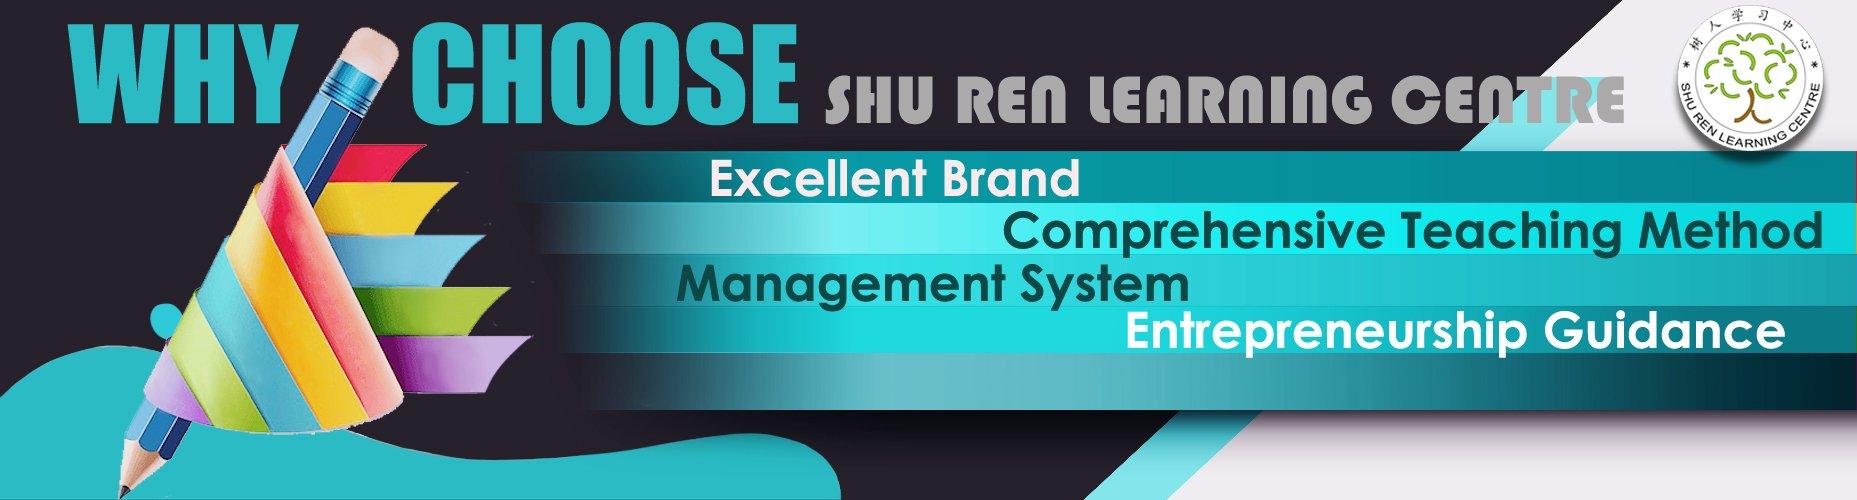 Shuren Teaching website 7